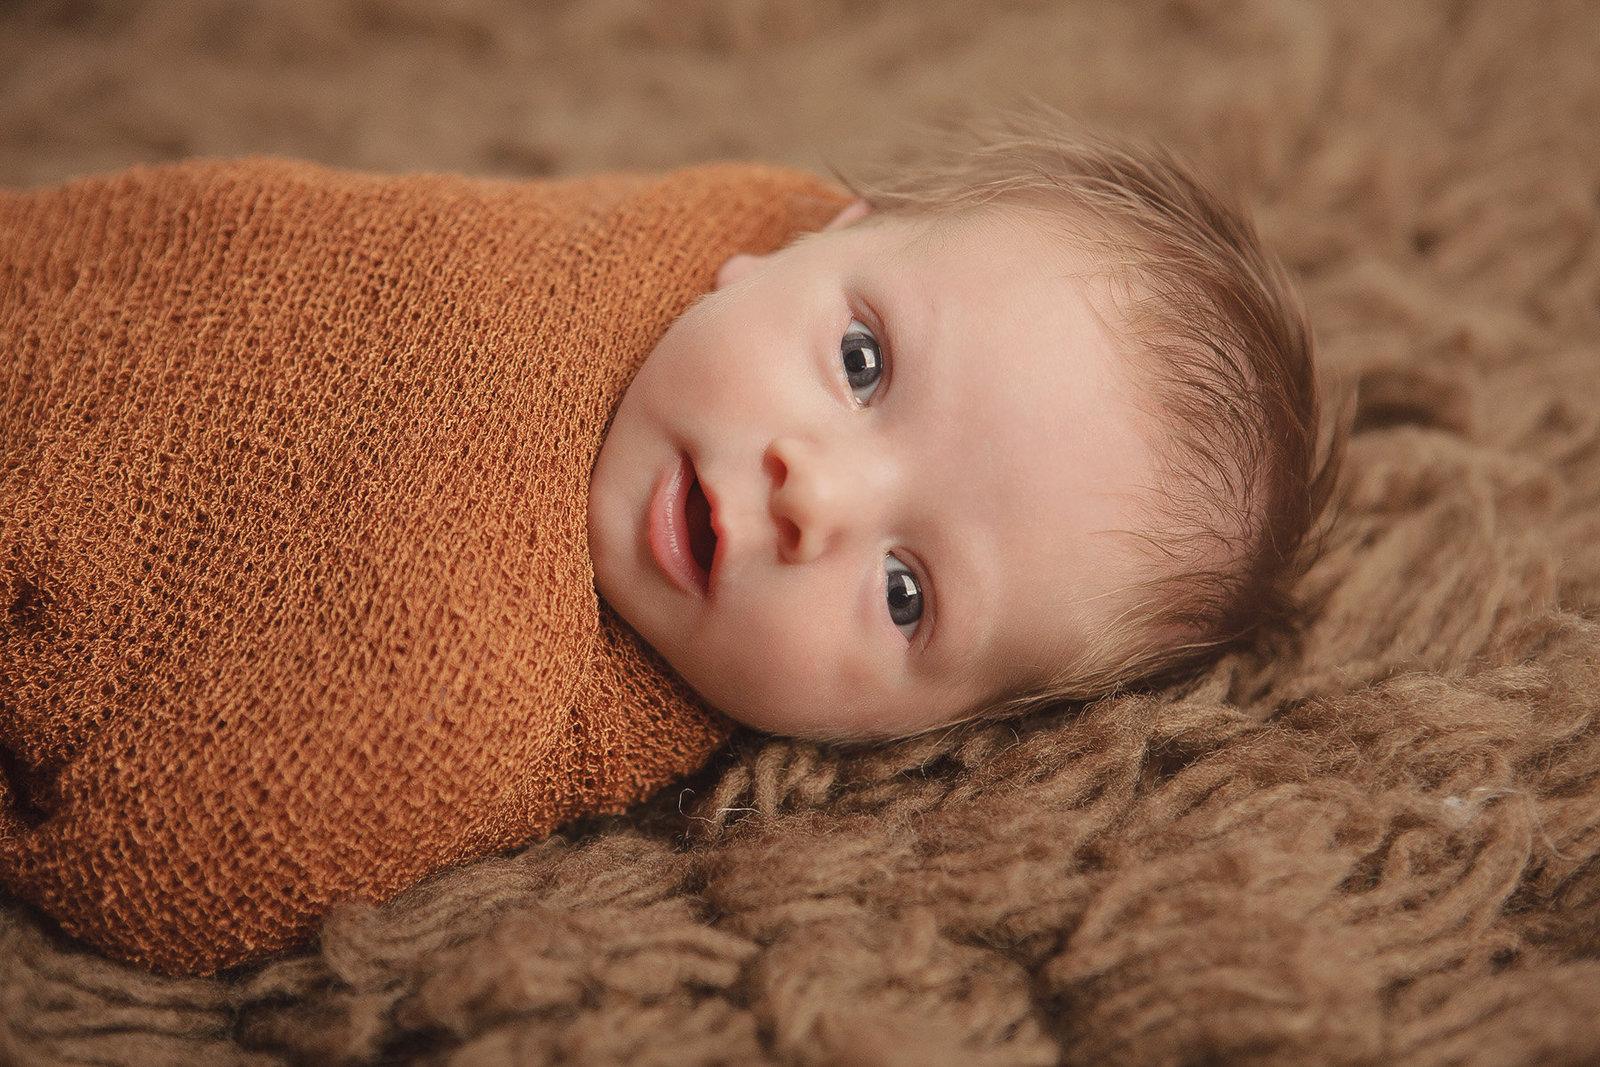 Mahwah NJ newborn baby awake photo by Hudson Valley professional photographer in Cornwall NY photo studio